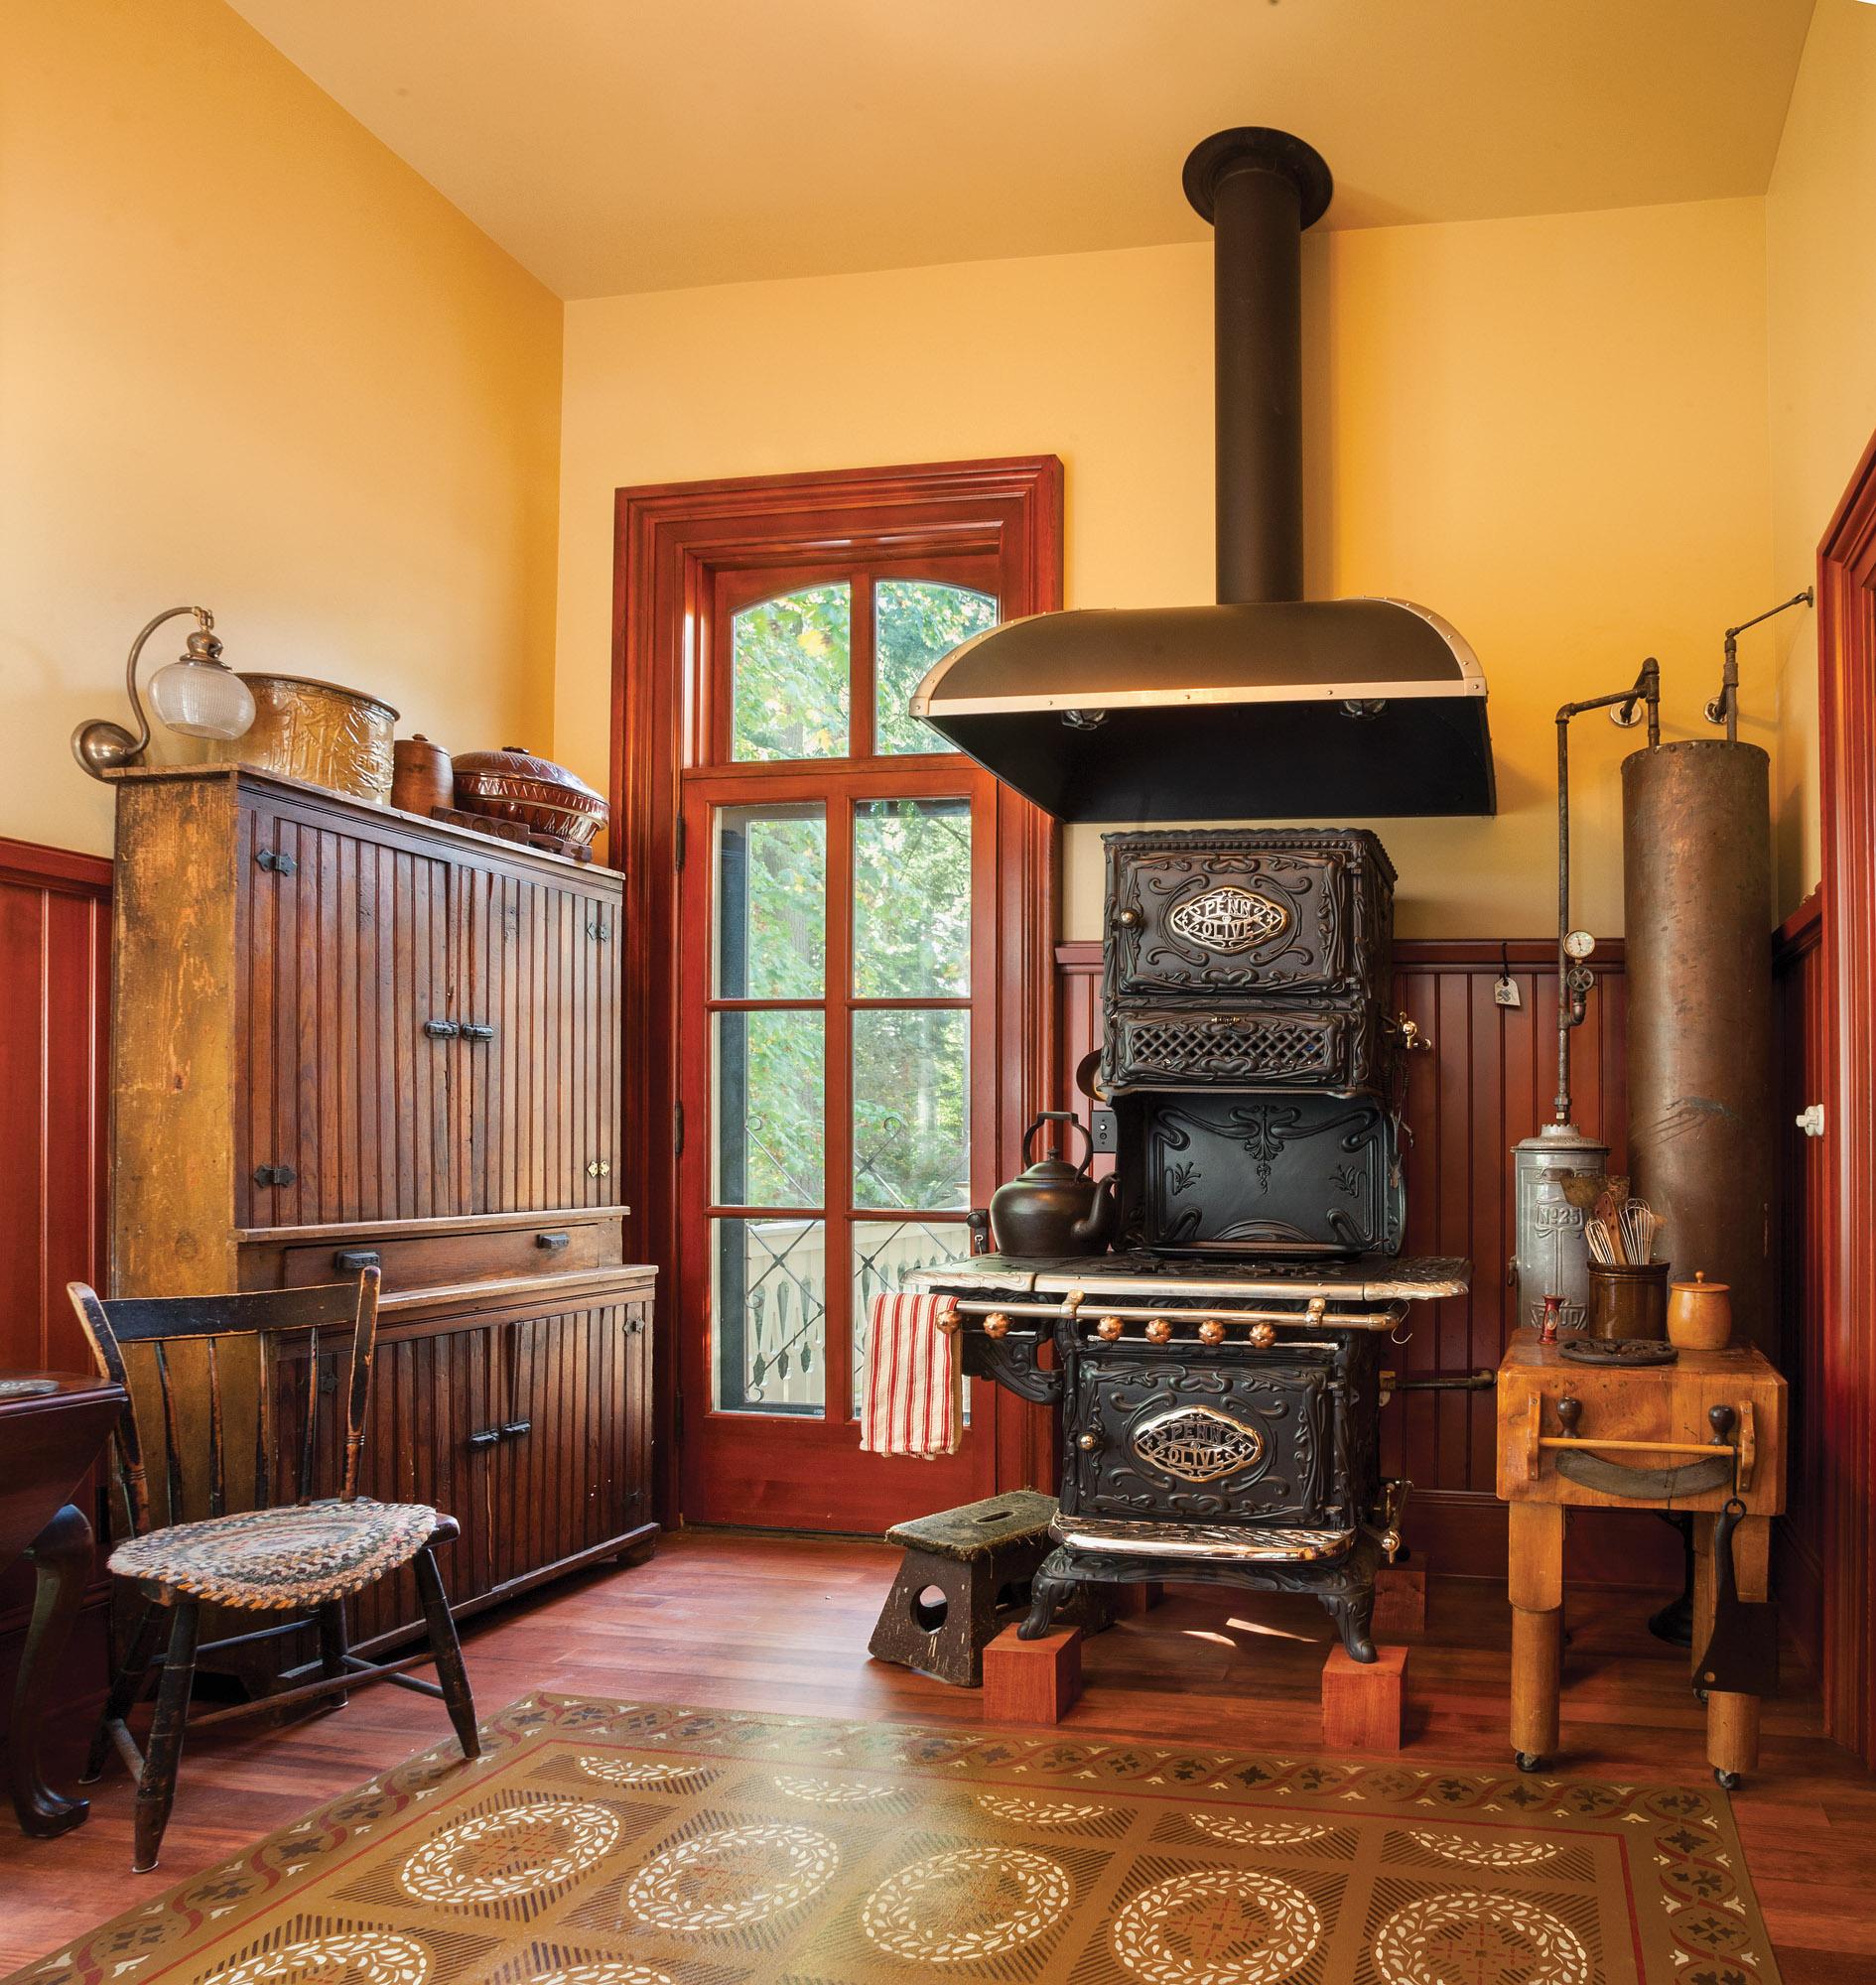 vintage kitchen, woodburning stove